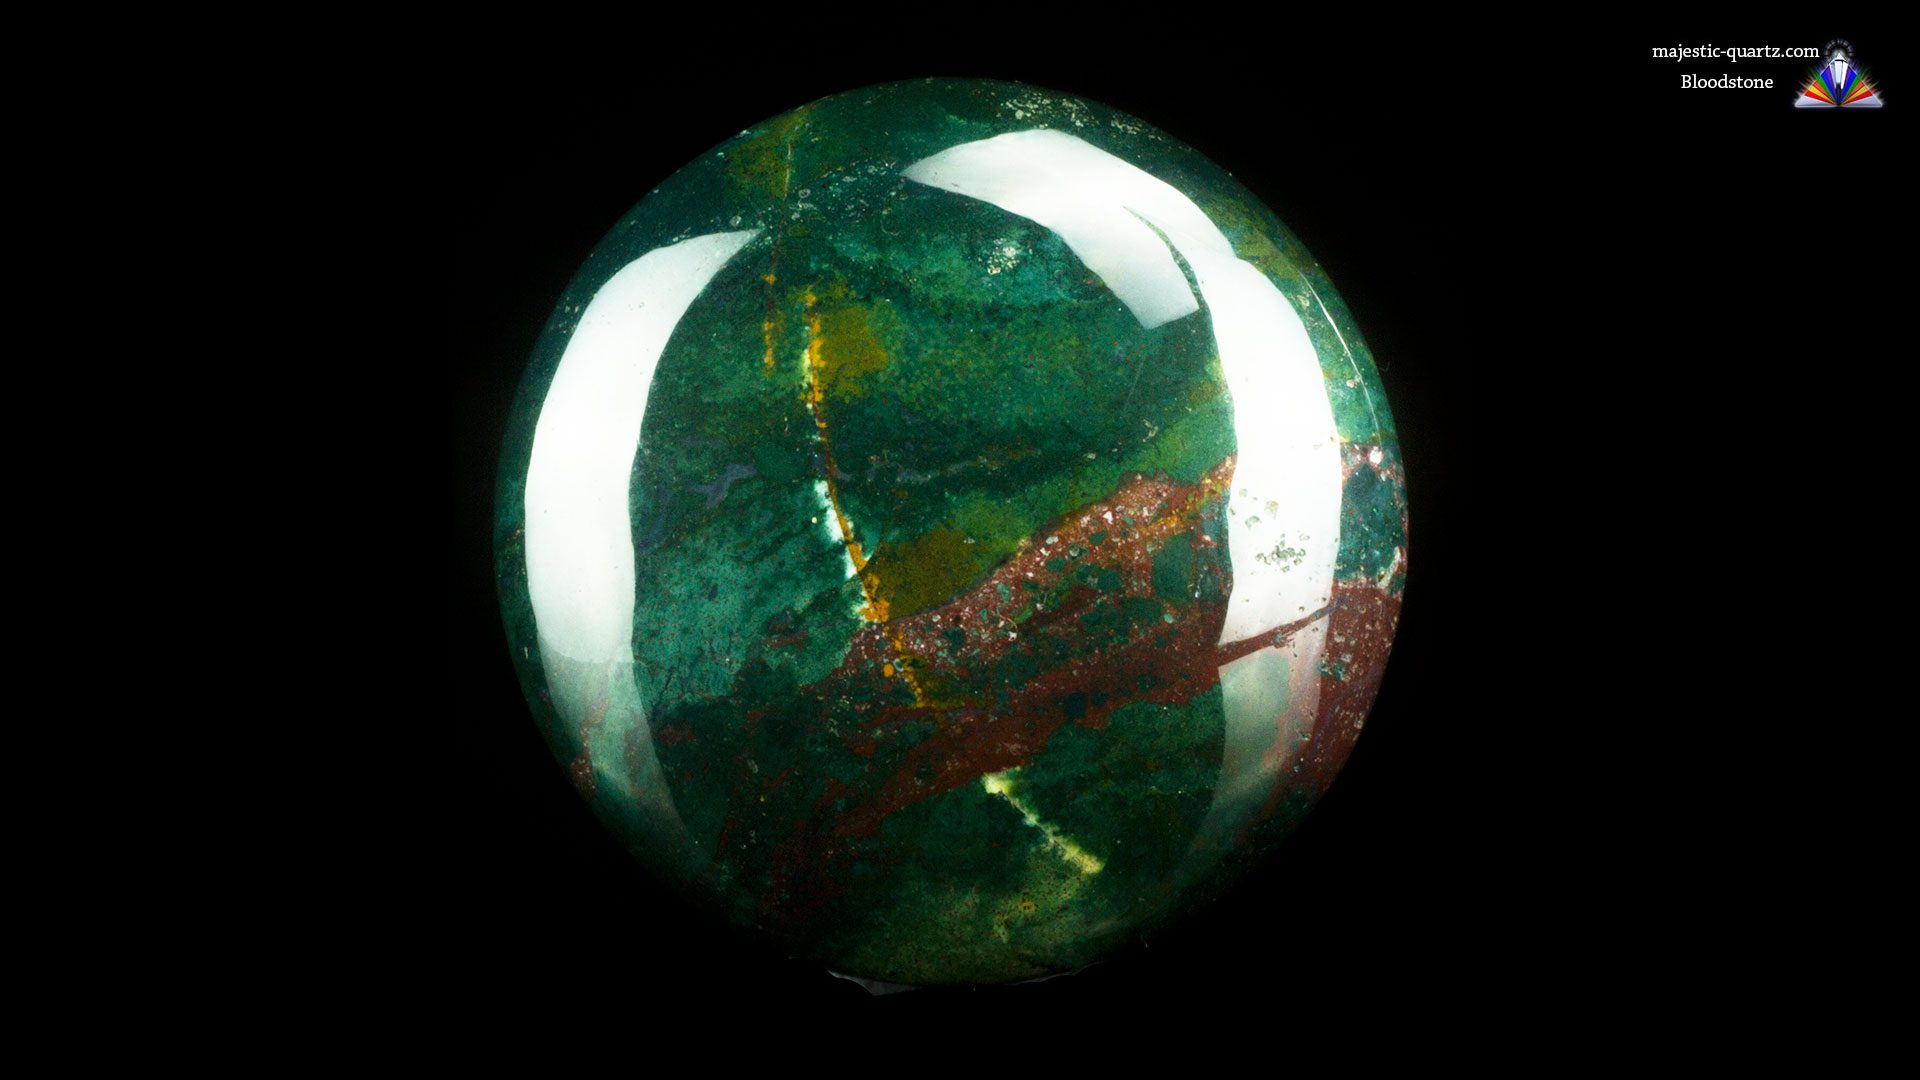 Bloodstone Crystal Specimen